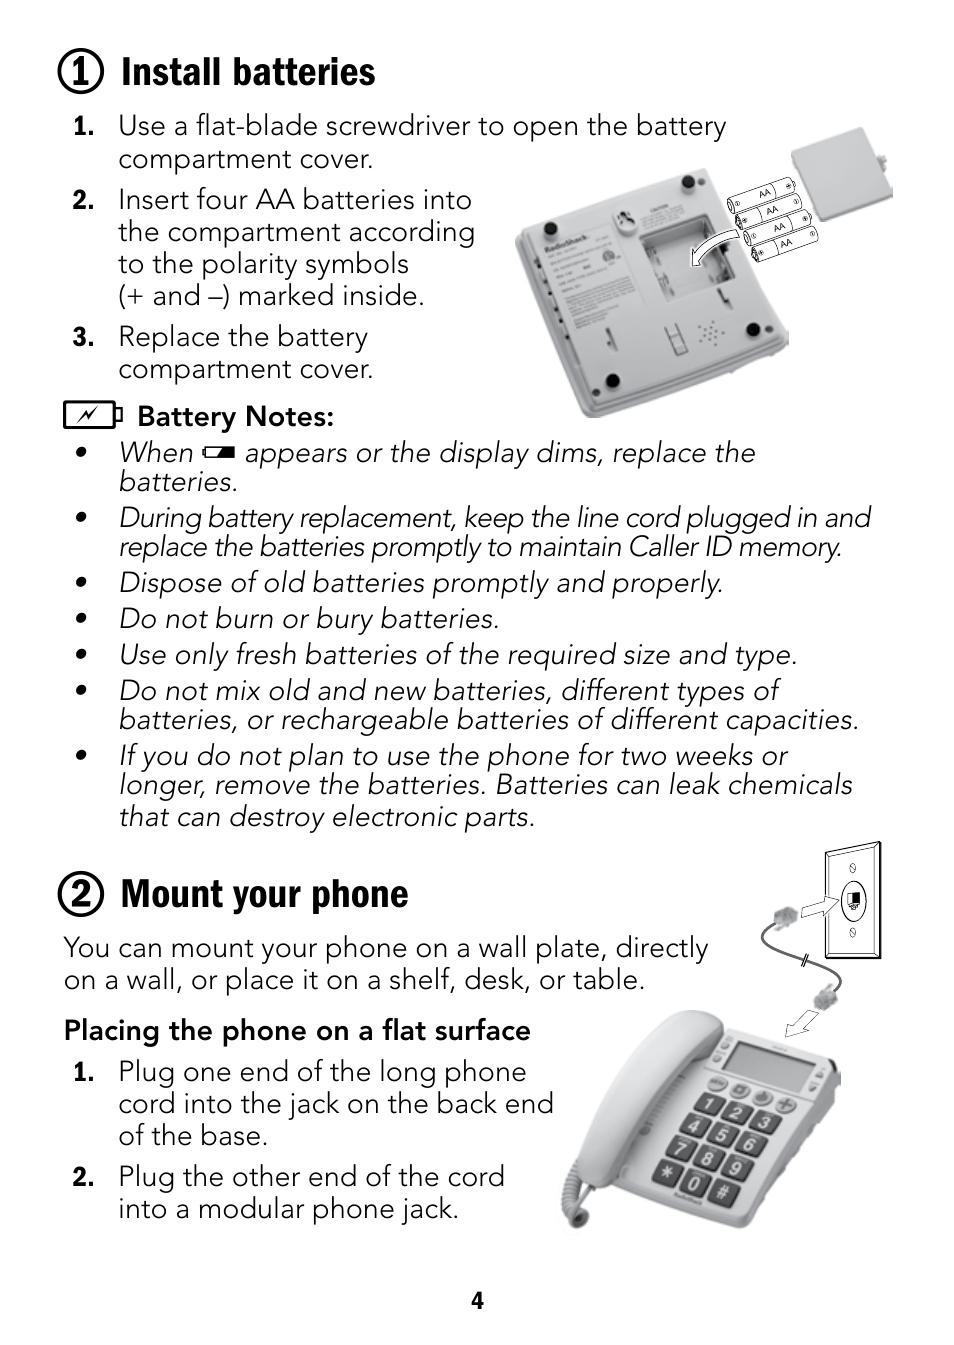 install batteries mount your phone radio shack 43 3901 user rh manualsdir com